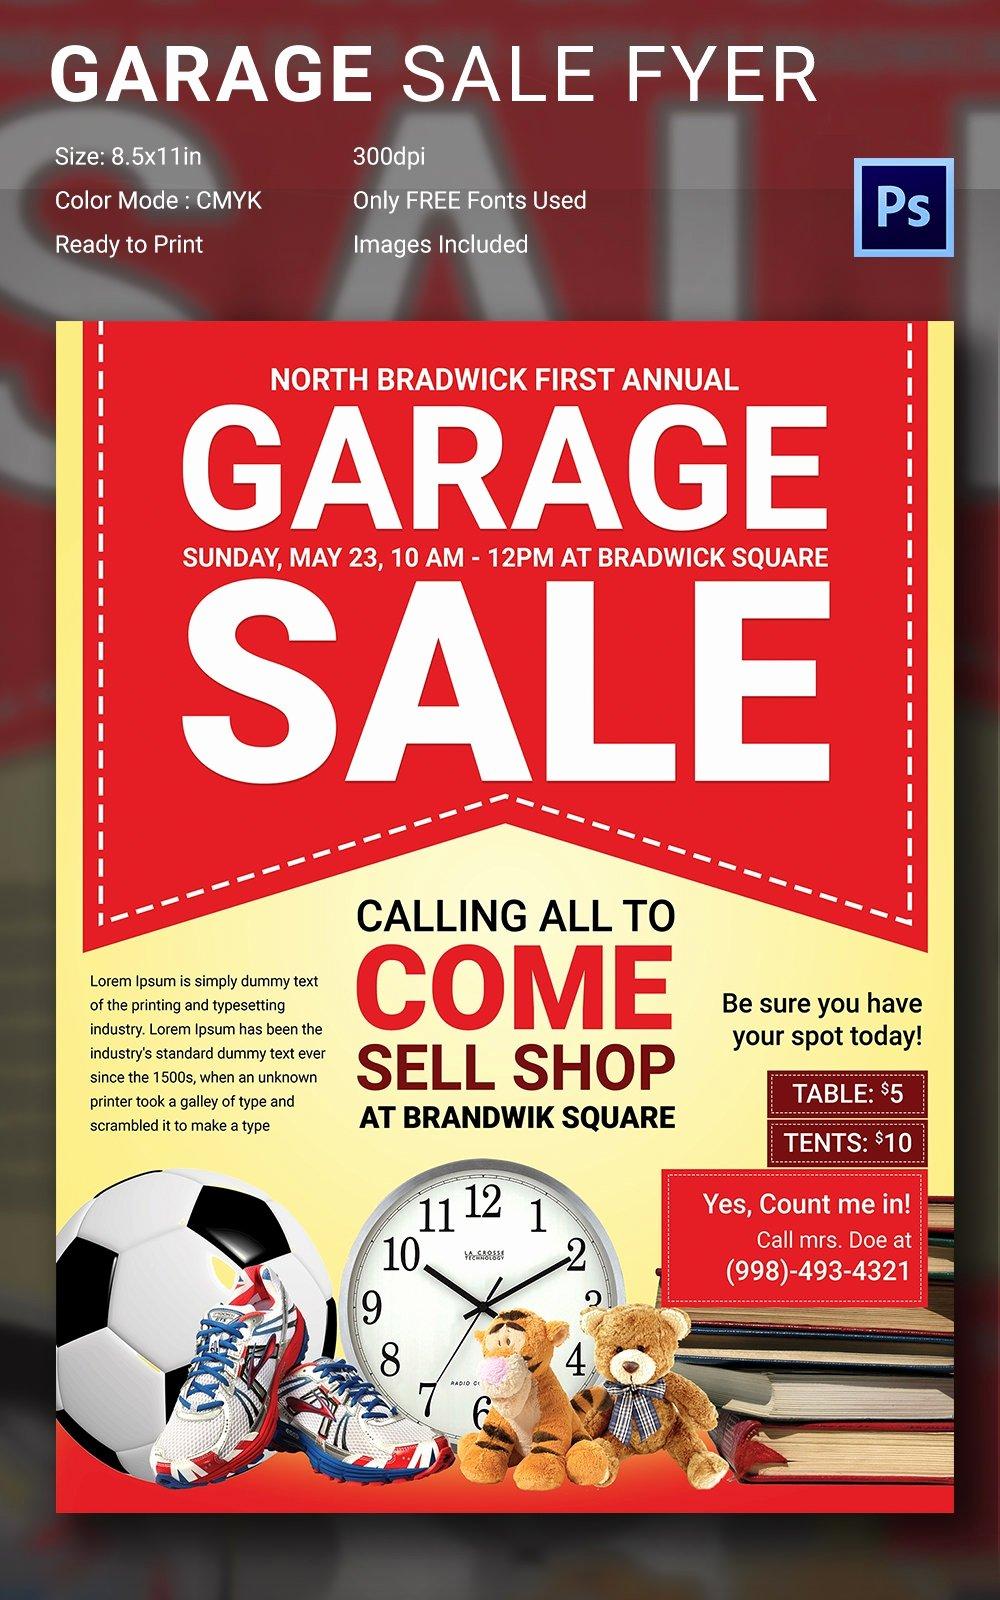 Garage Sale Flyer Template Fresh 14 Best Yard Sale Flyer Templates & Psd Designs